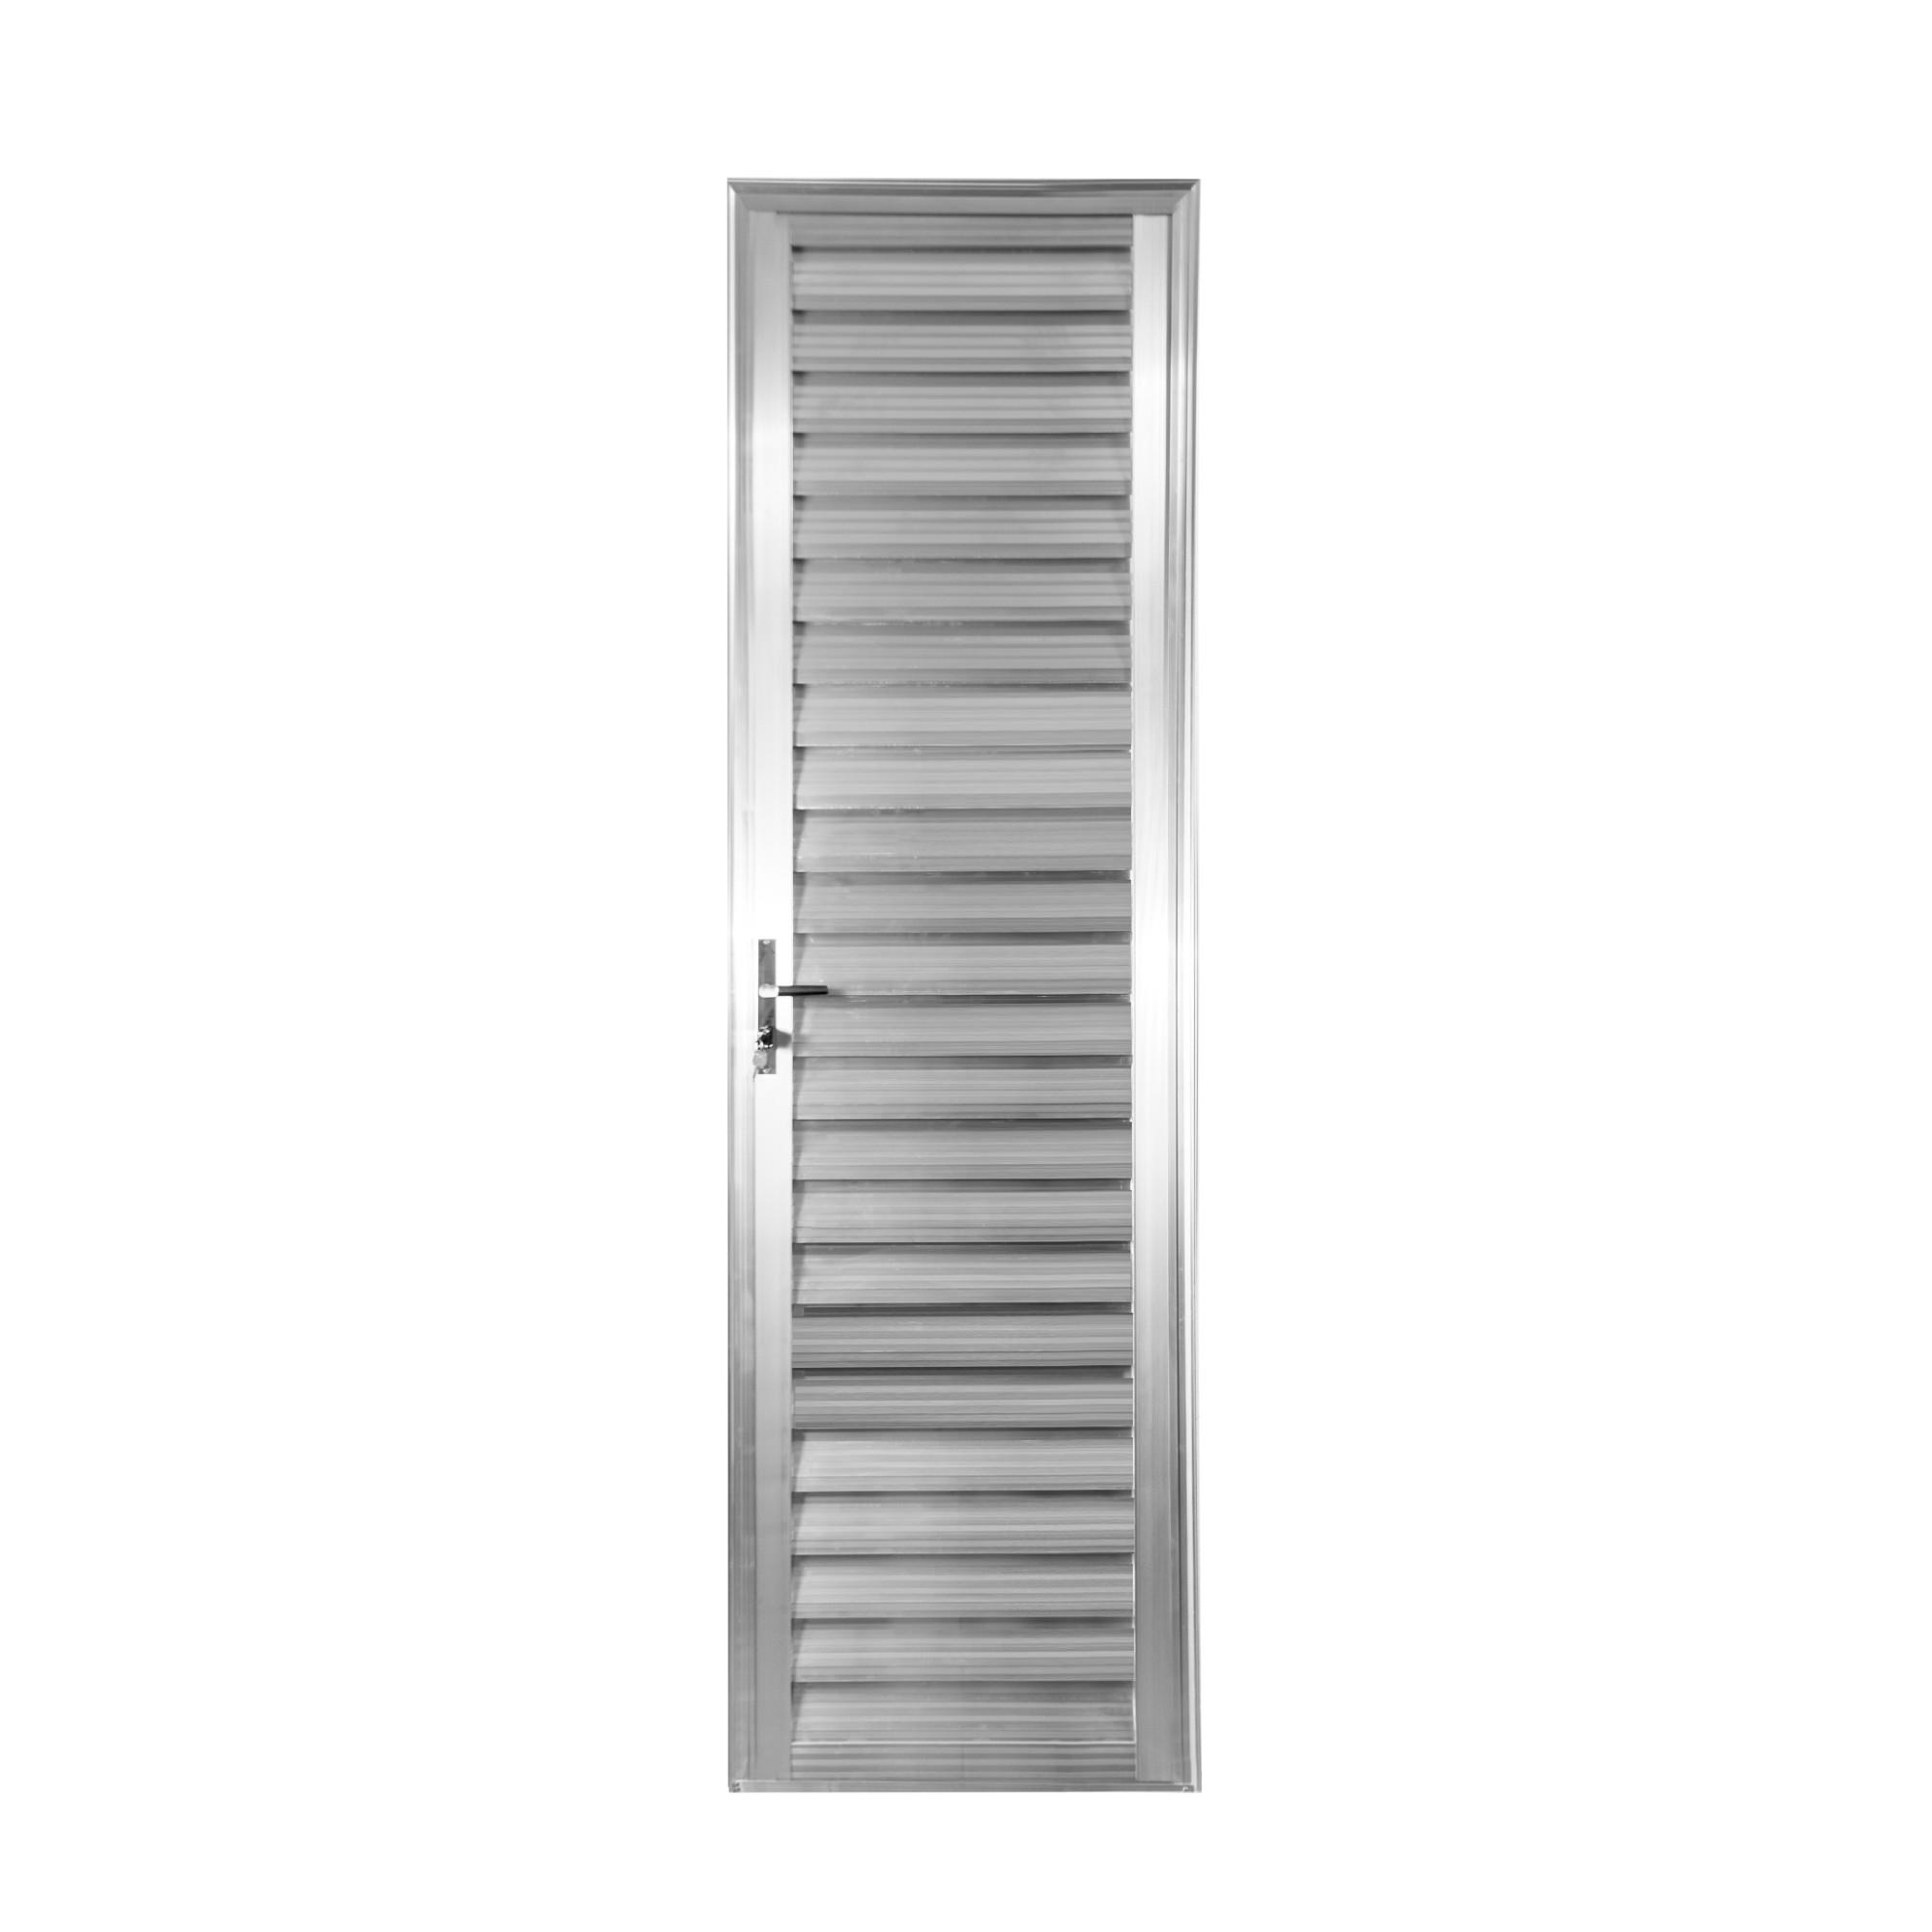 Porta de Abrir de Aluminio 210cm x 60cm Veneziana Lado Direito - Aluvid